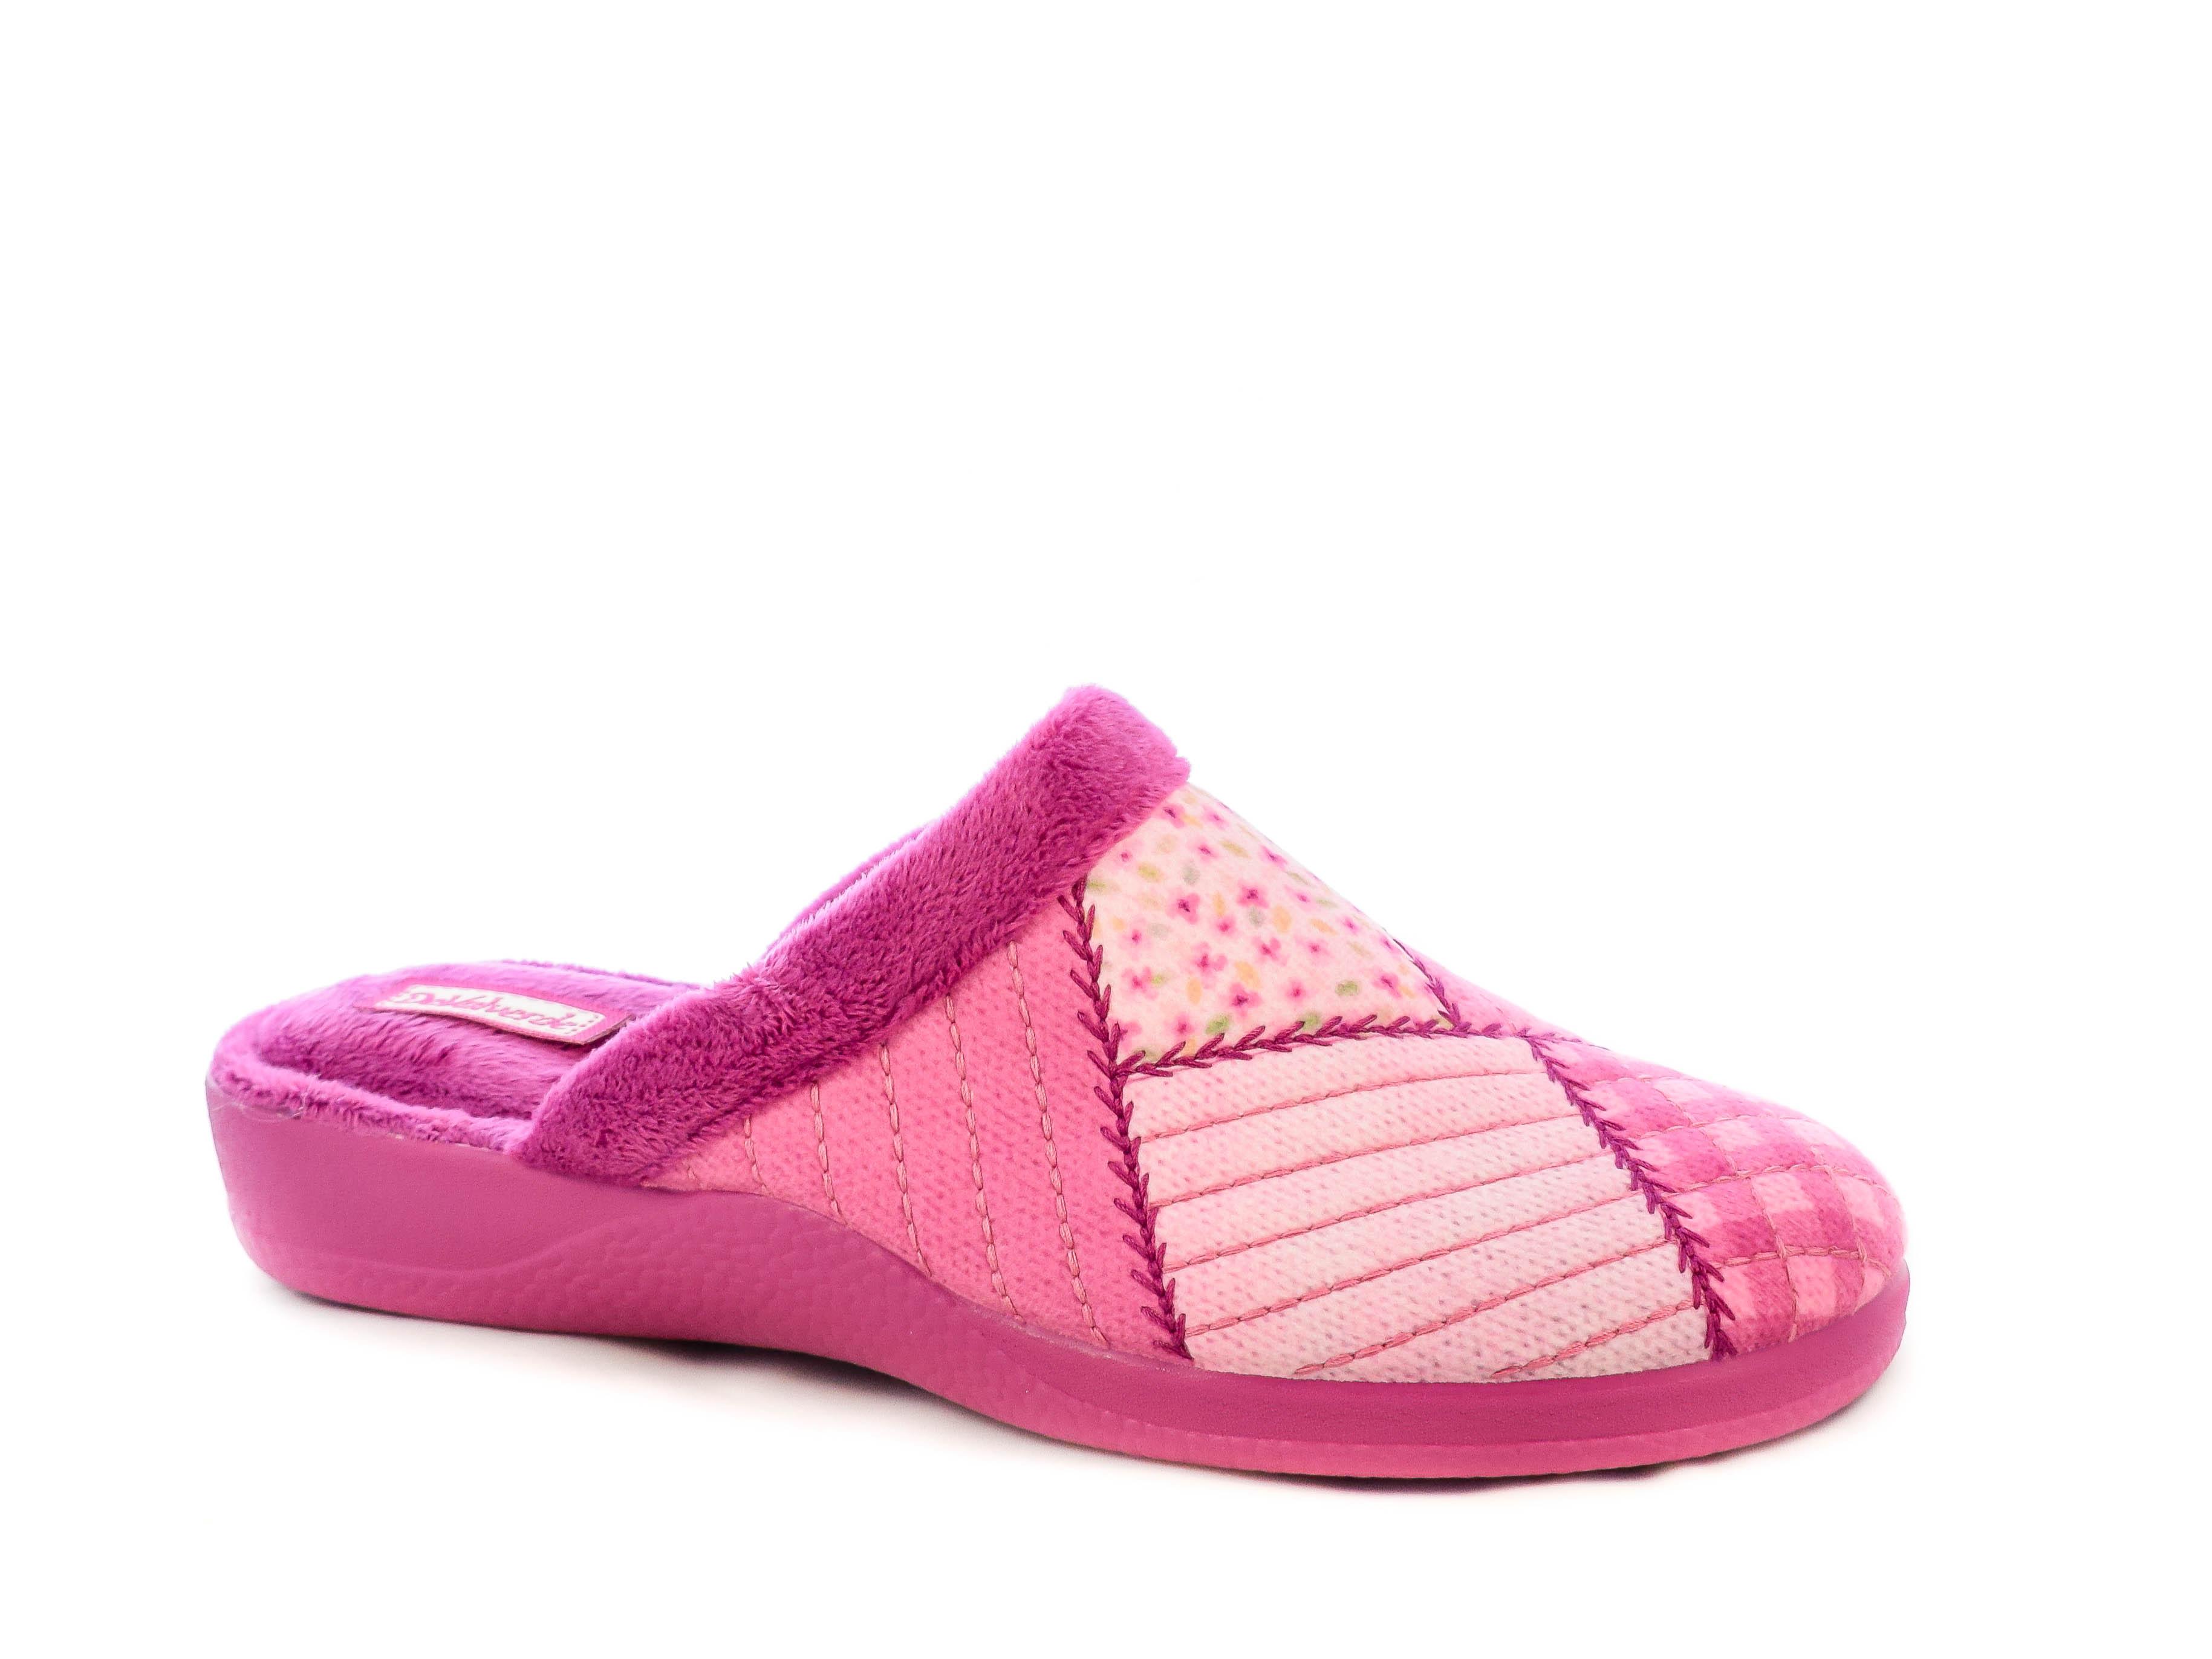 DeValverde DV117 PINK Ροζ